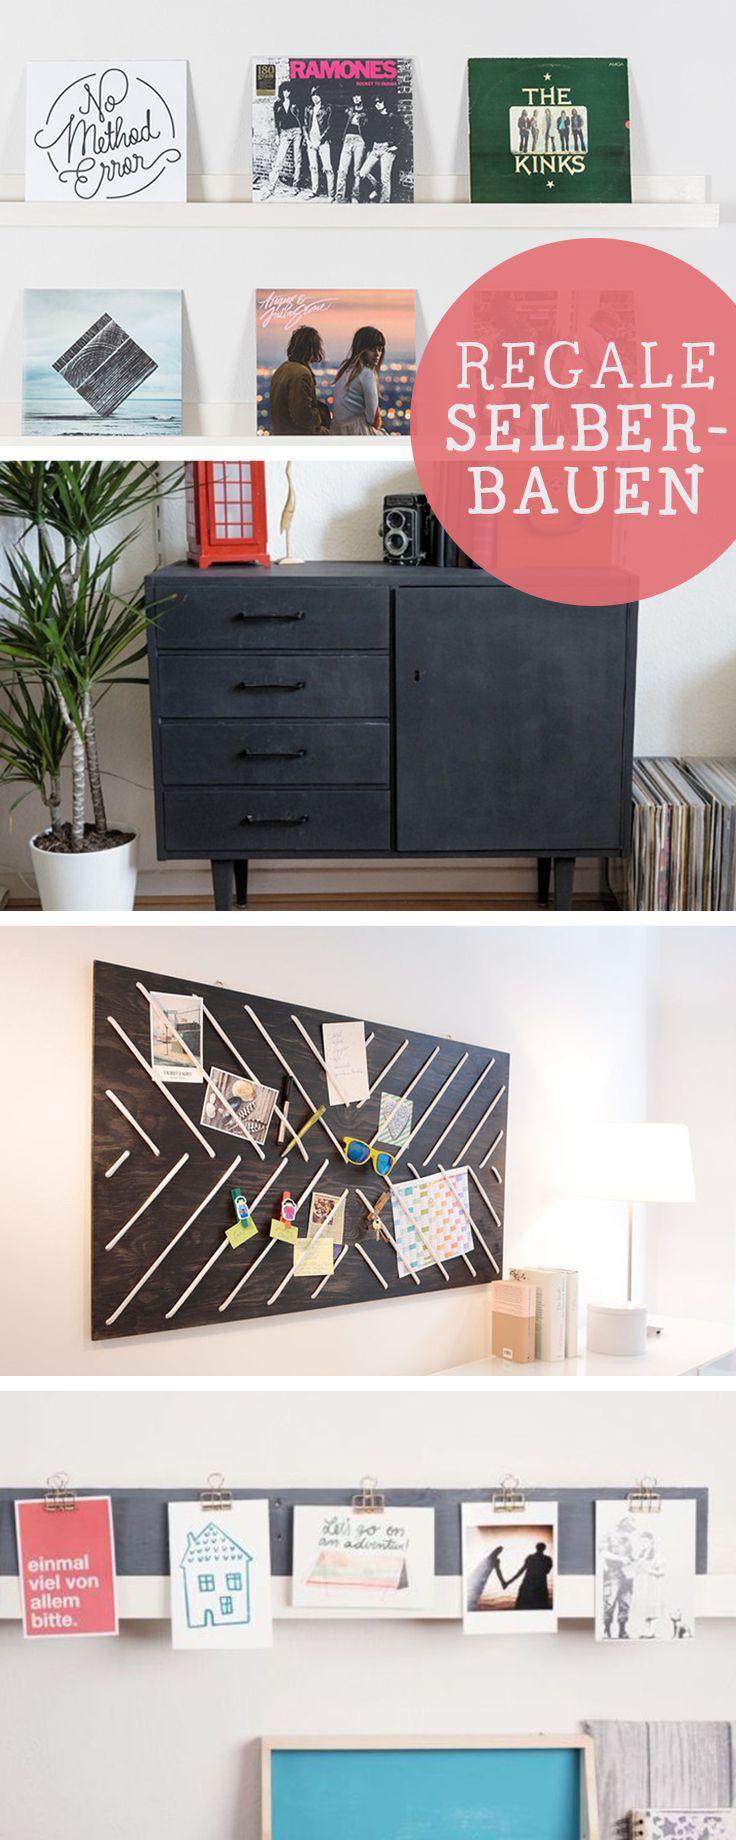 Die besten DIY-Ideen für Regale, Wohnung selbermachen / diy living tutorials for shelves, home decor via DaWanda.com